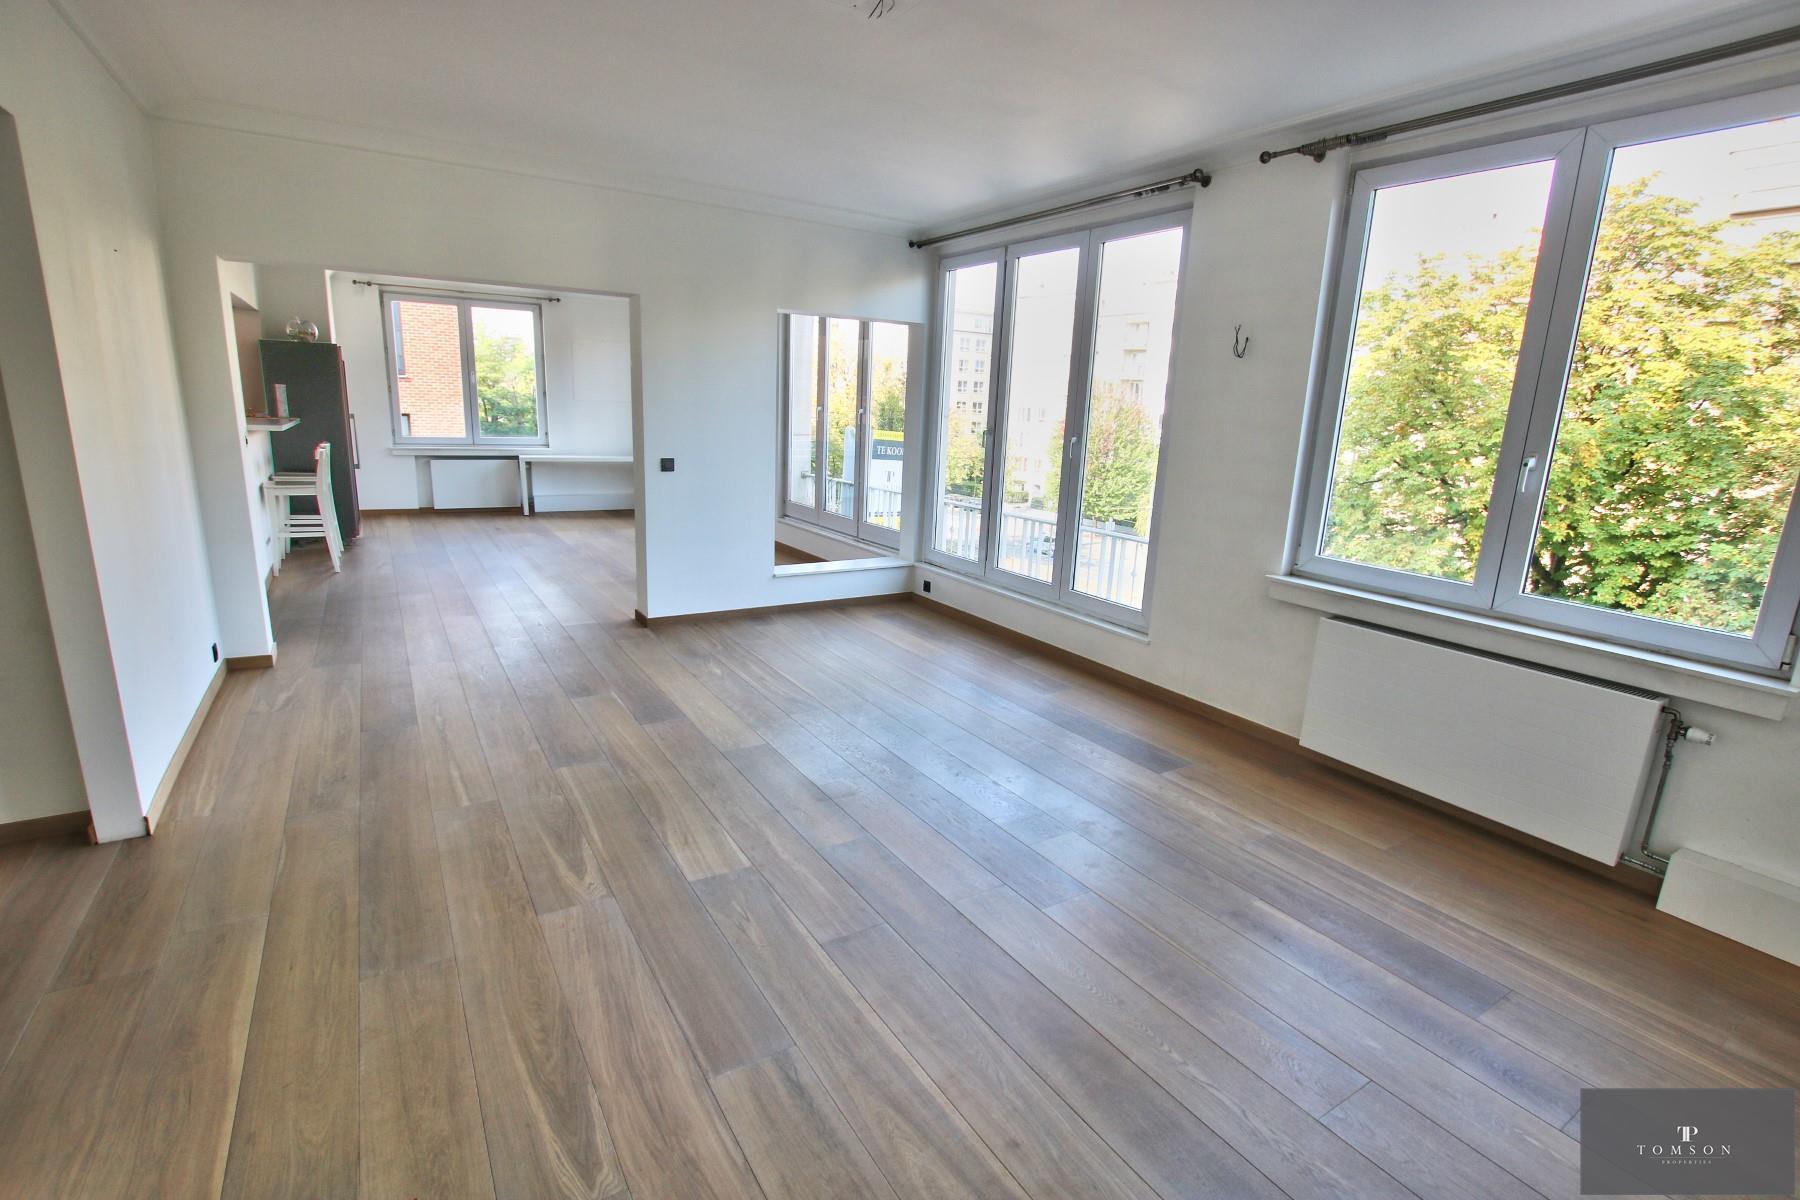 Flat - Etterbeek - #4154759-0